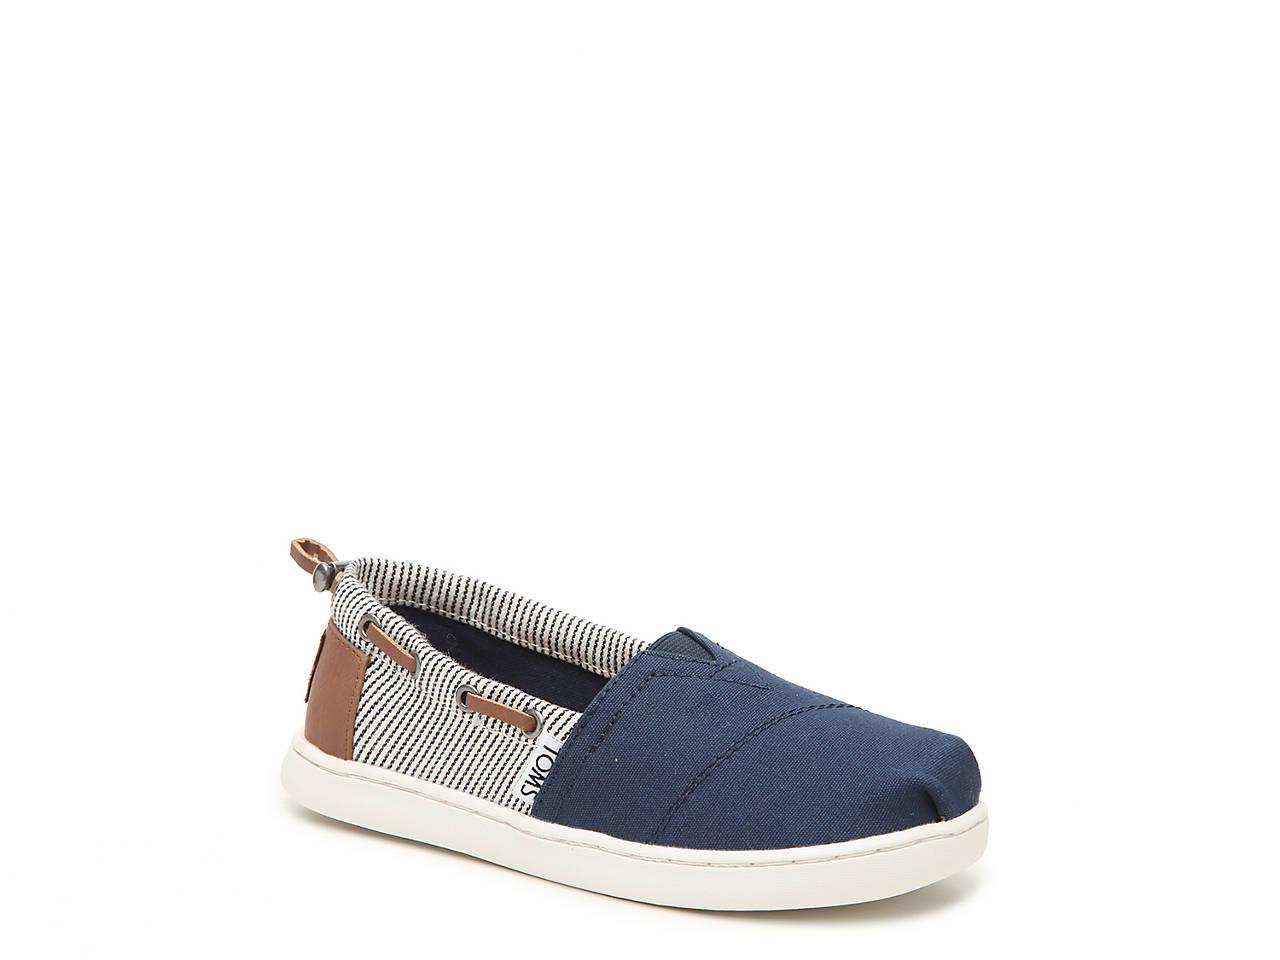 d1859330208 TOMS Bimini Toddler   Youth Slip-On Sneaker Kids Shoes